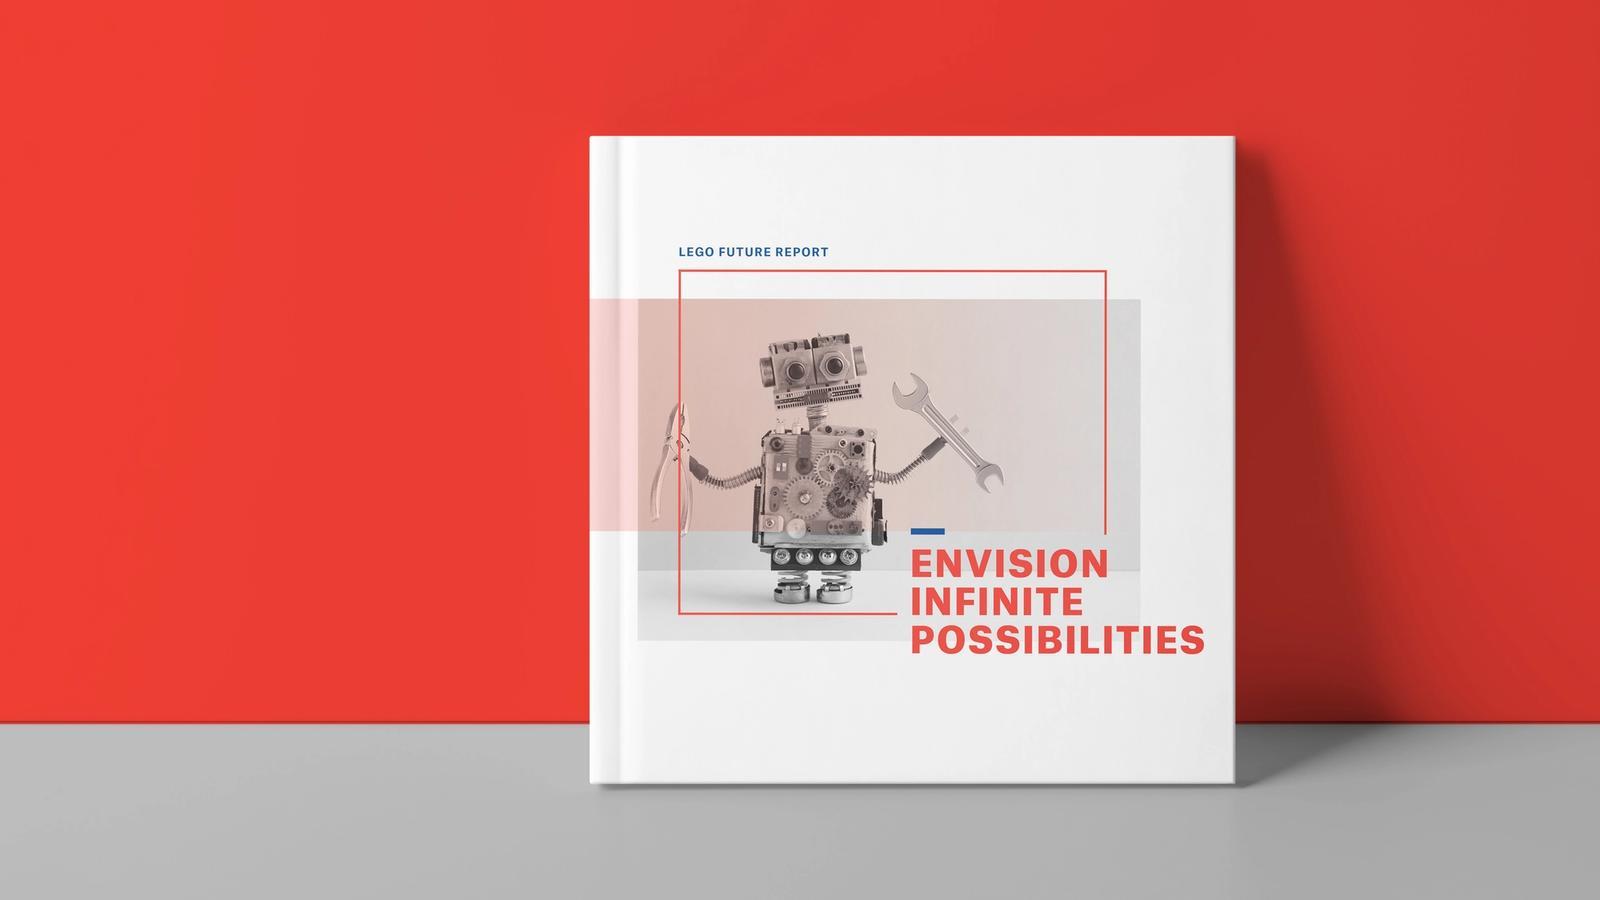 Lego Special Report // Envision Infinite Possibilities